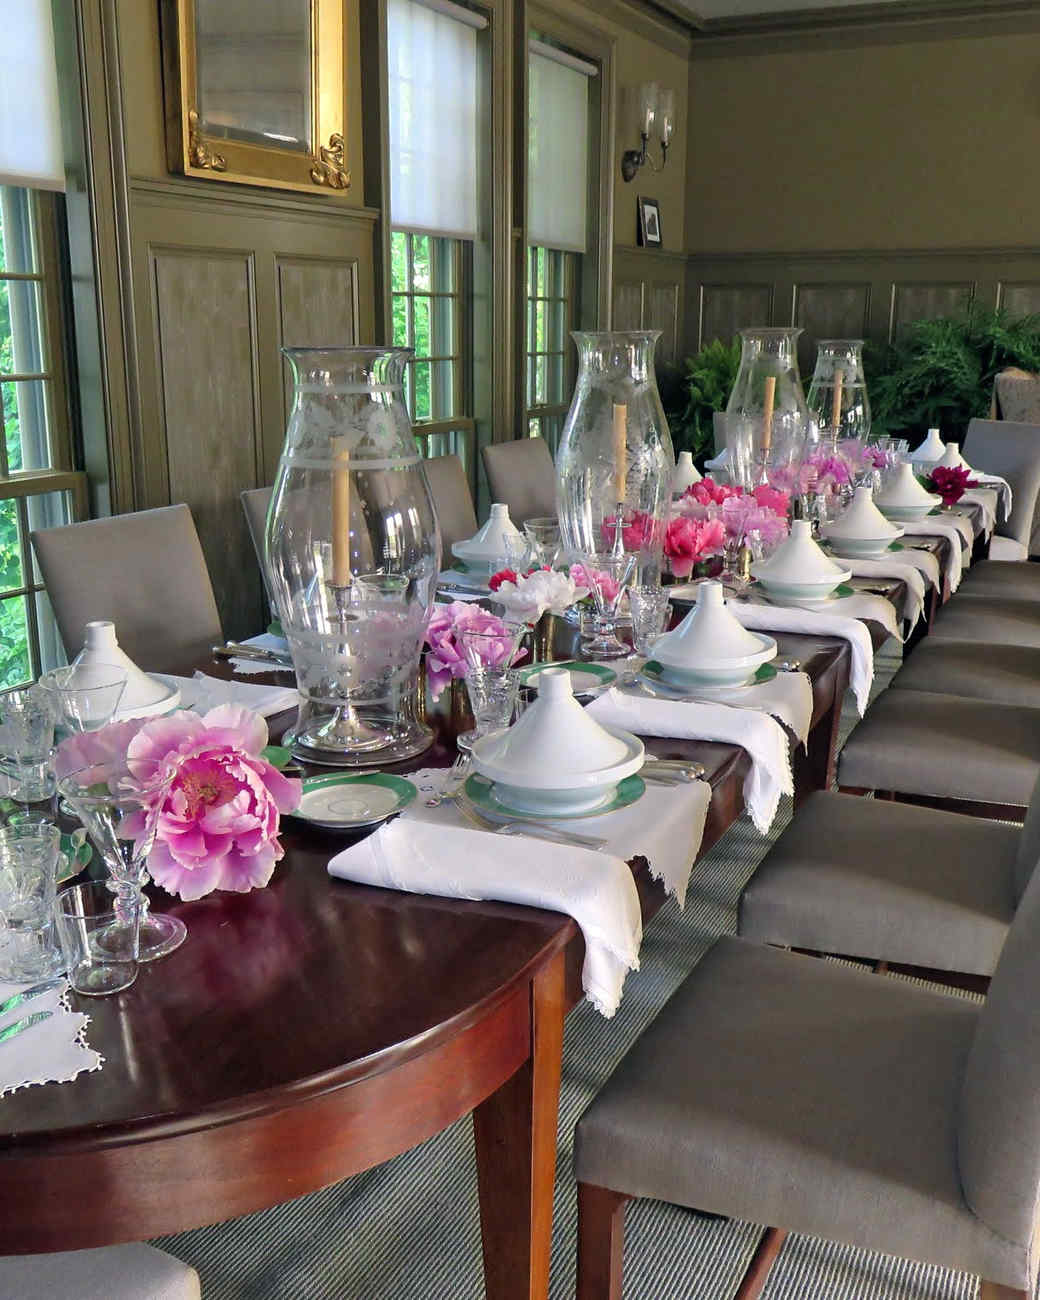 bedford-moroccan-dinner-13-0615.jpg